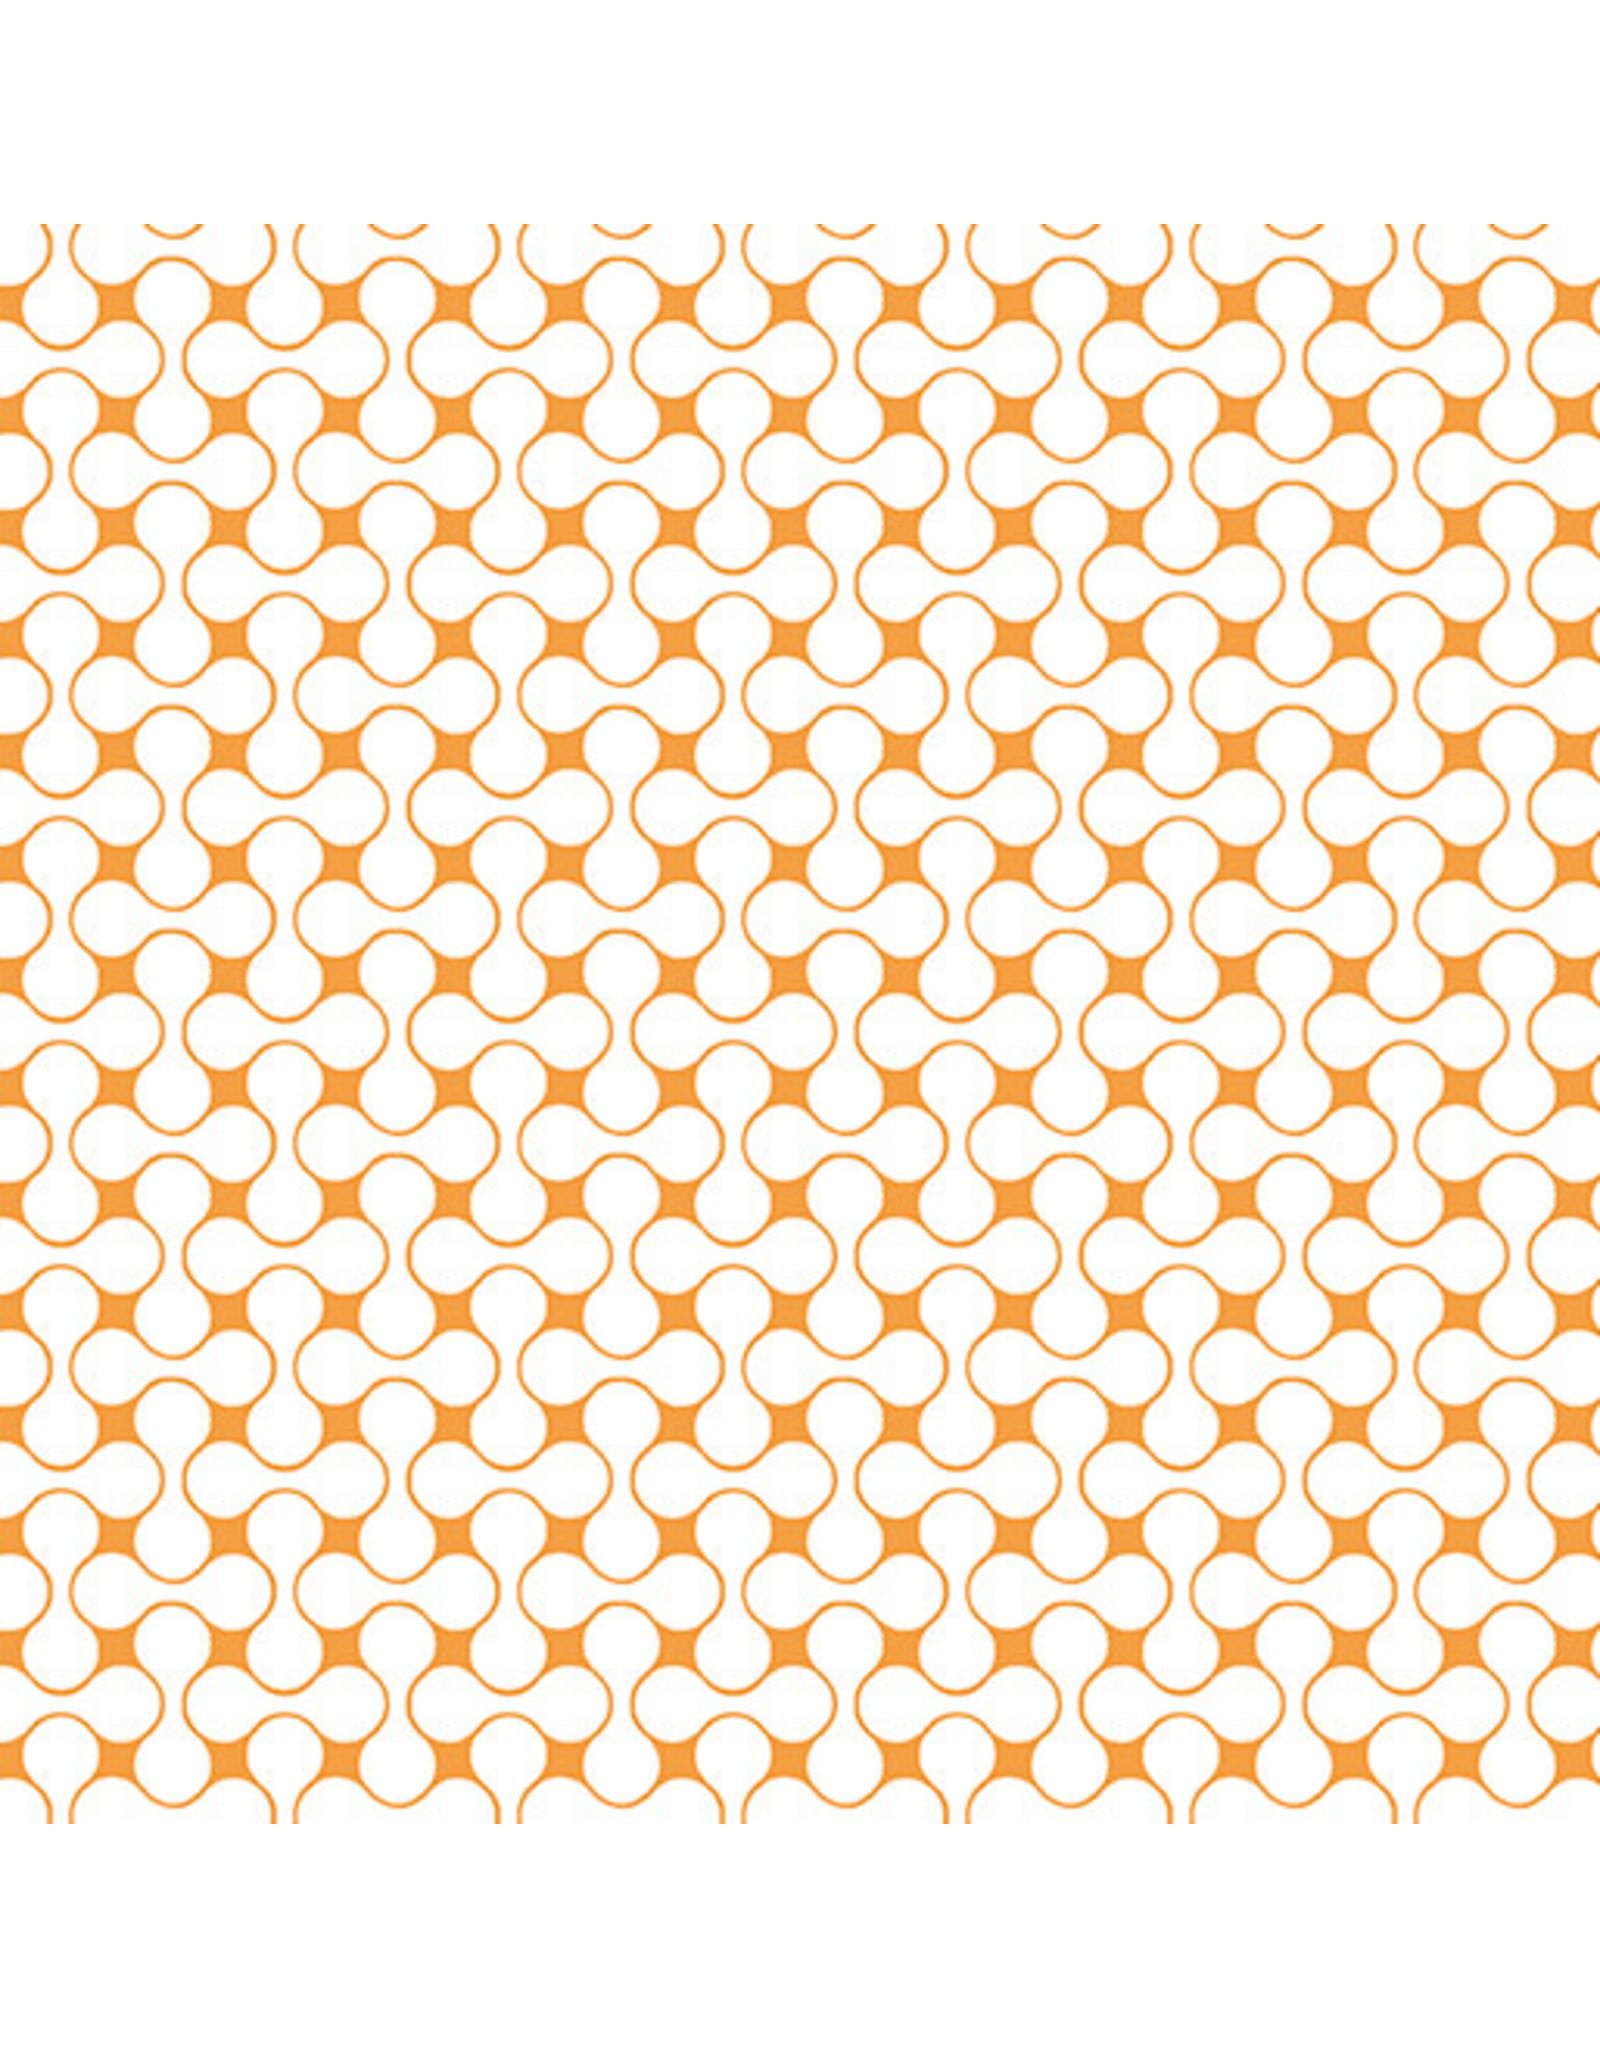 Contempo Good Vibes - Interconnected Orange/White